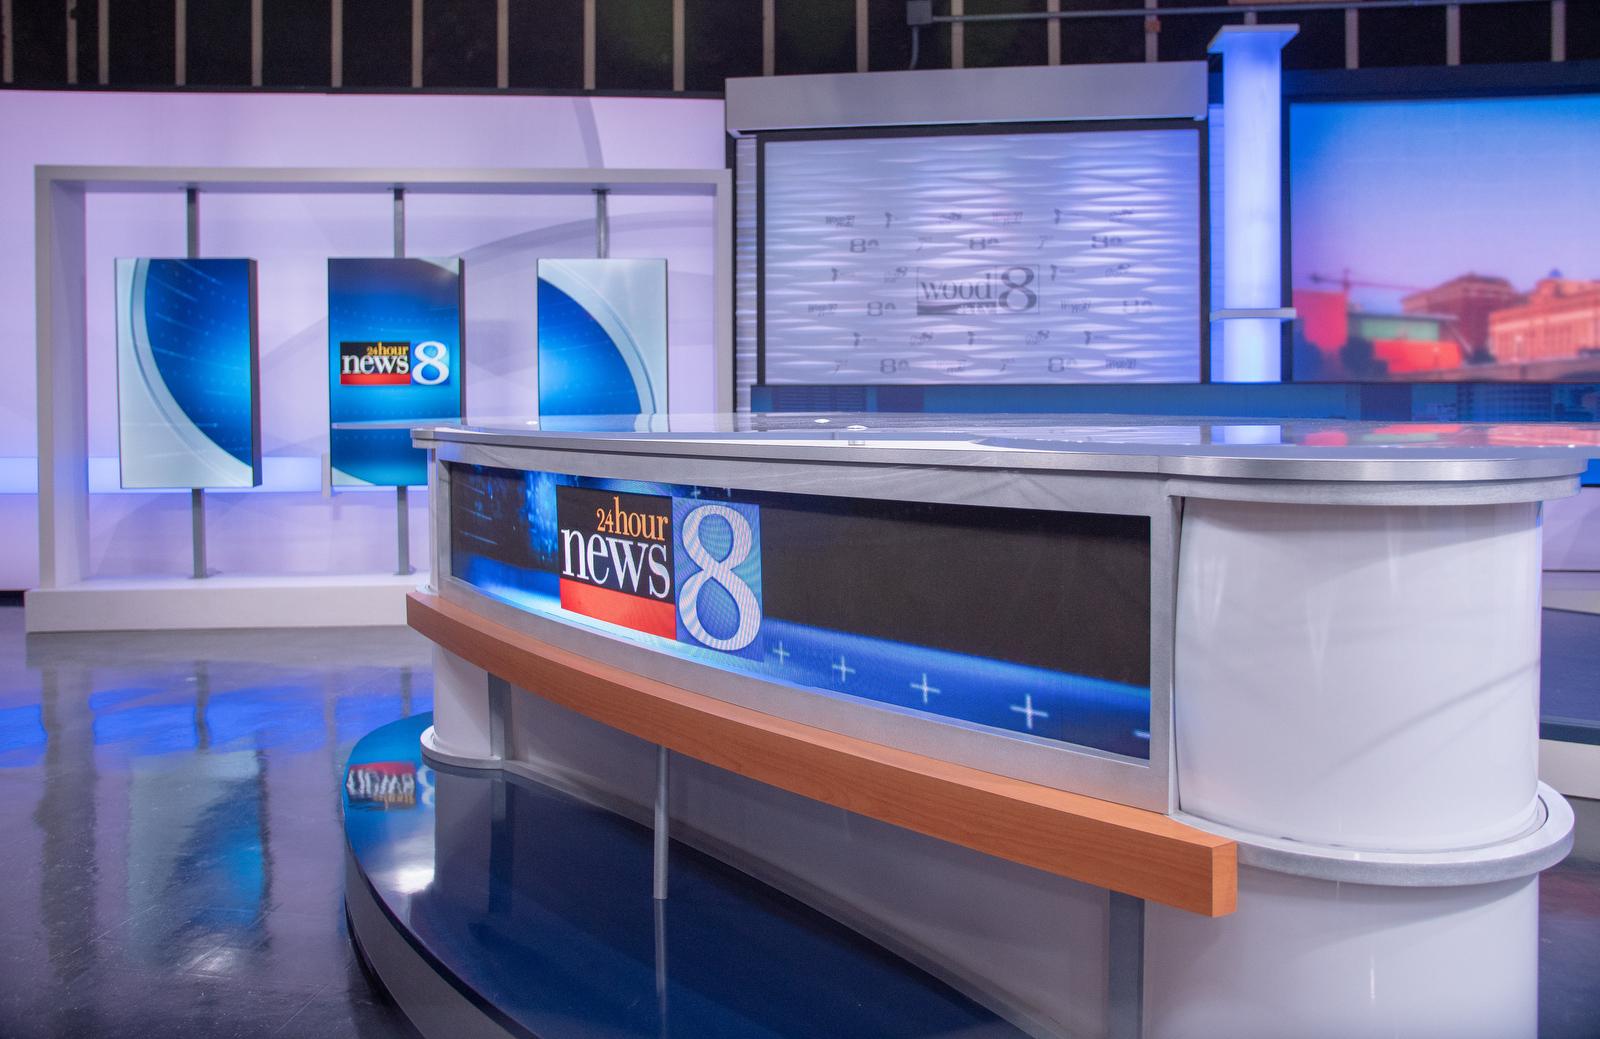 NCS_WOOD-TV8-broadcast-studio_0002